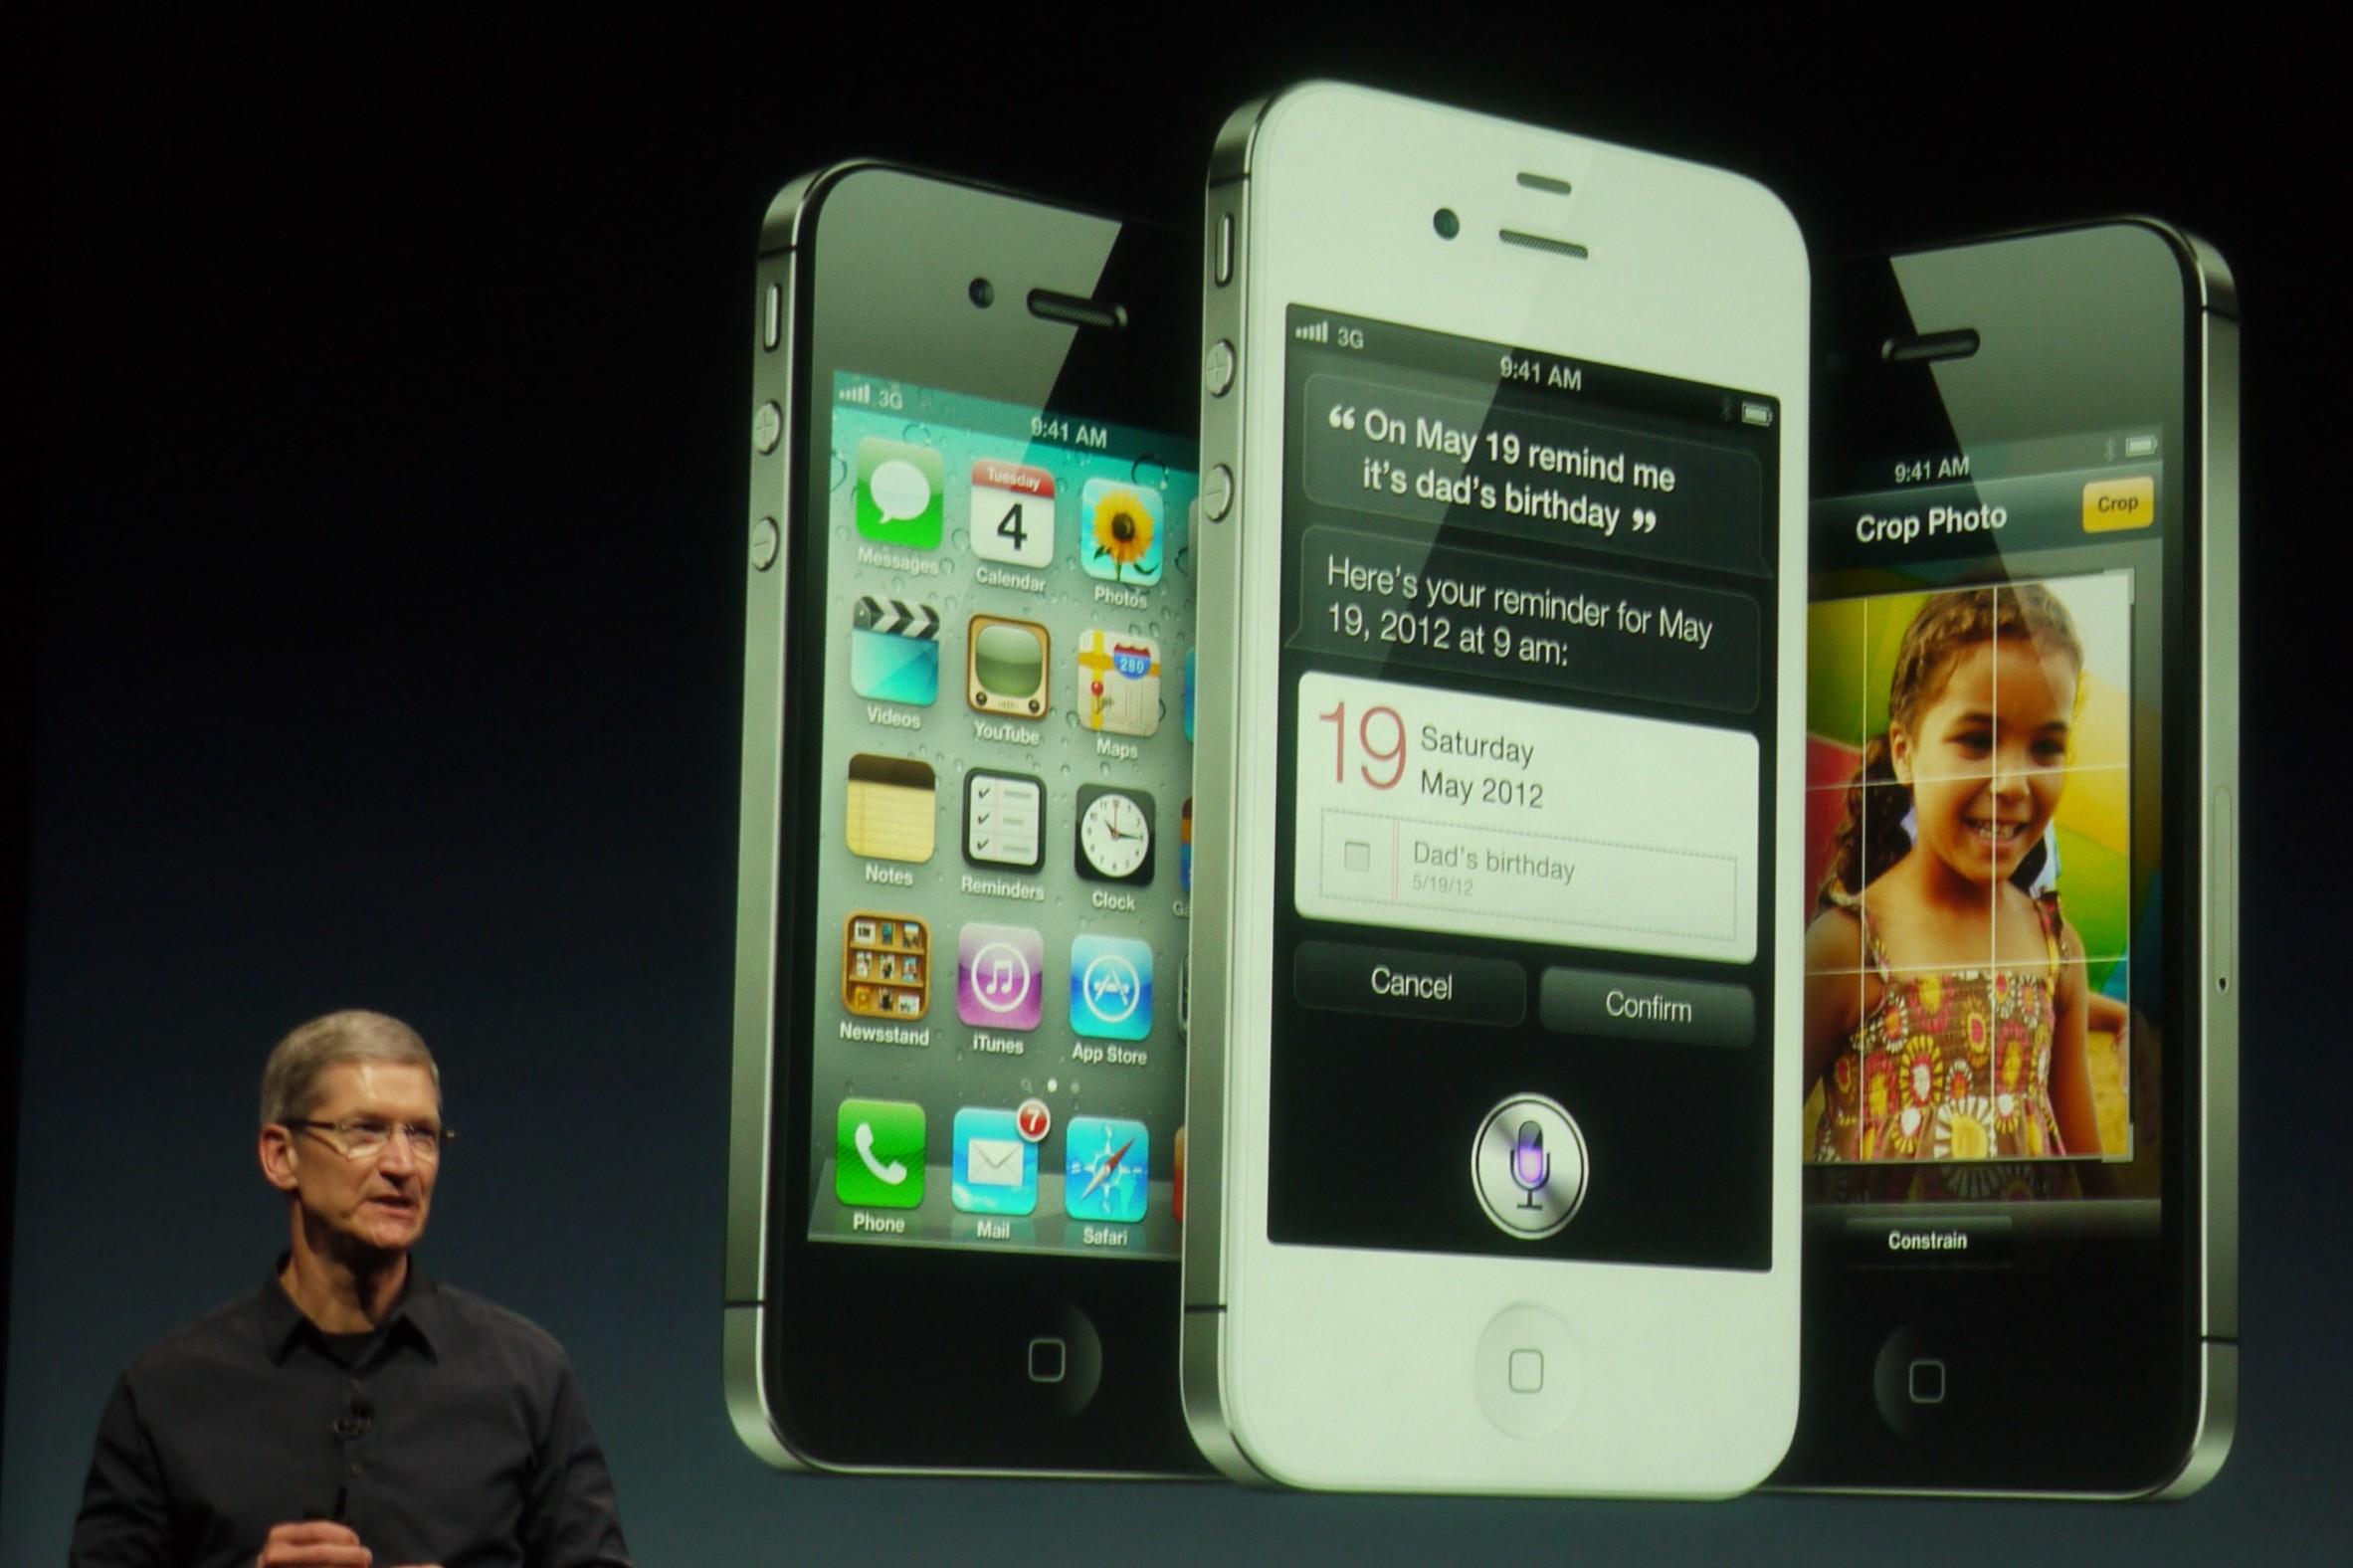 Apple Event 10/4 Tim Cook iPhones